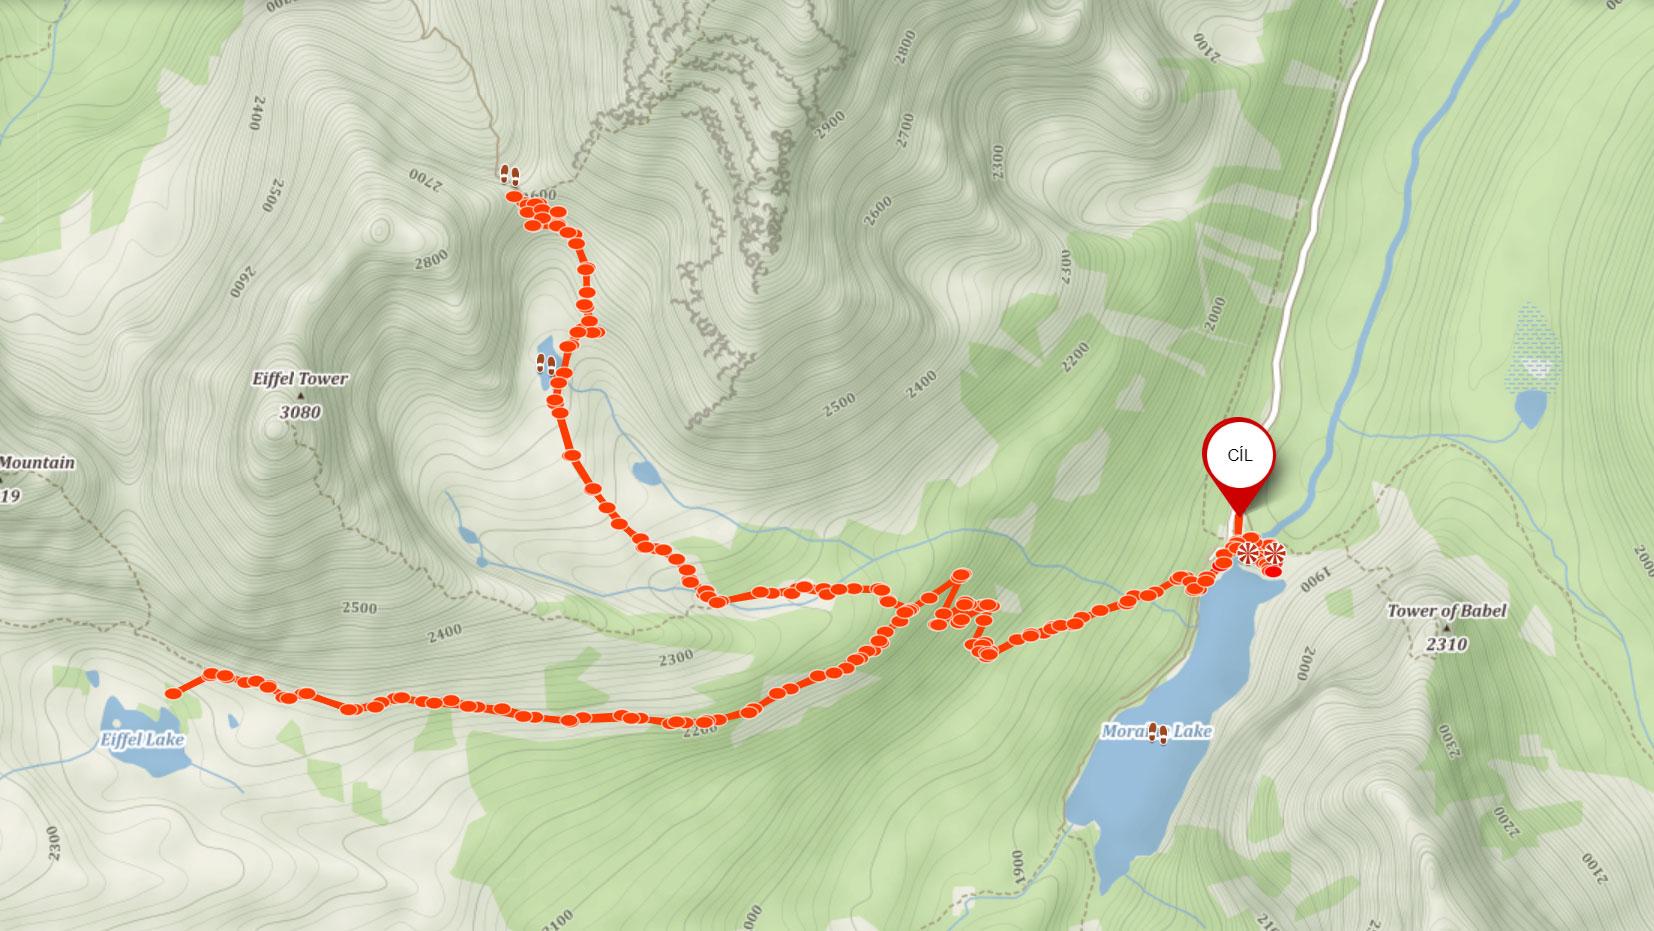 Popisovaná trasa od Moraine Lake na Sentinel Pass a Eiffel Lake